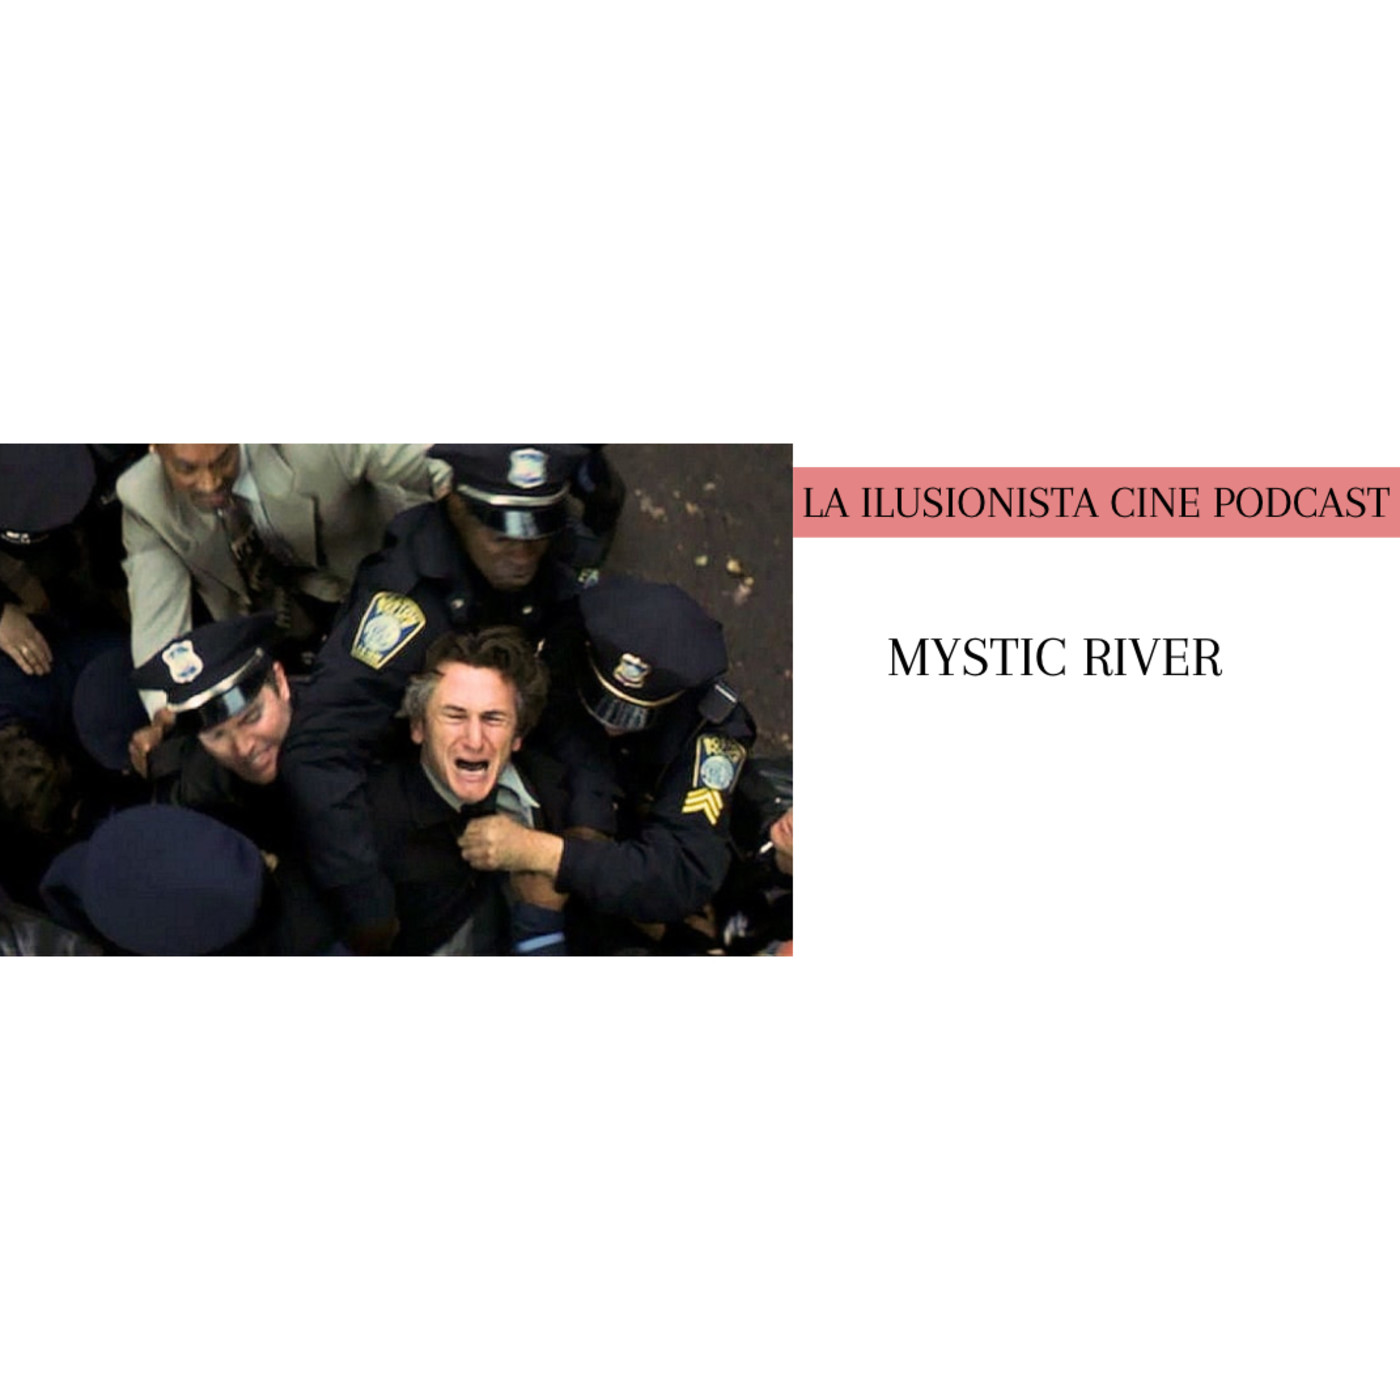 La Ilusionista Cine: Mystic River de Clint Eastwood